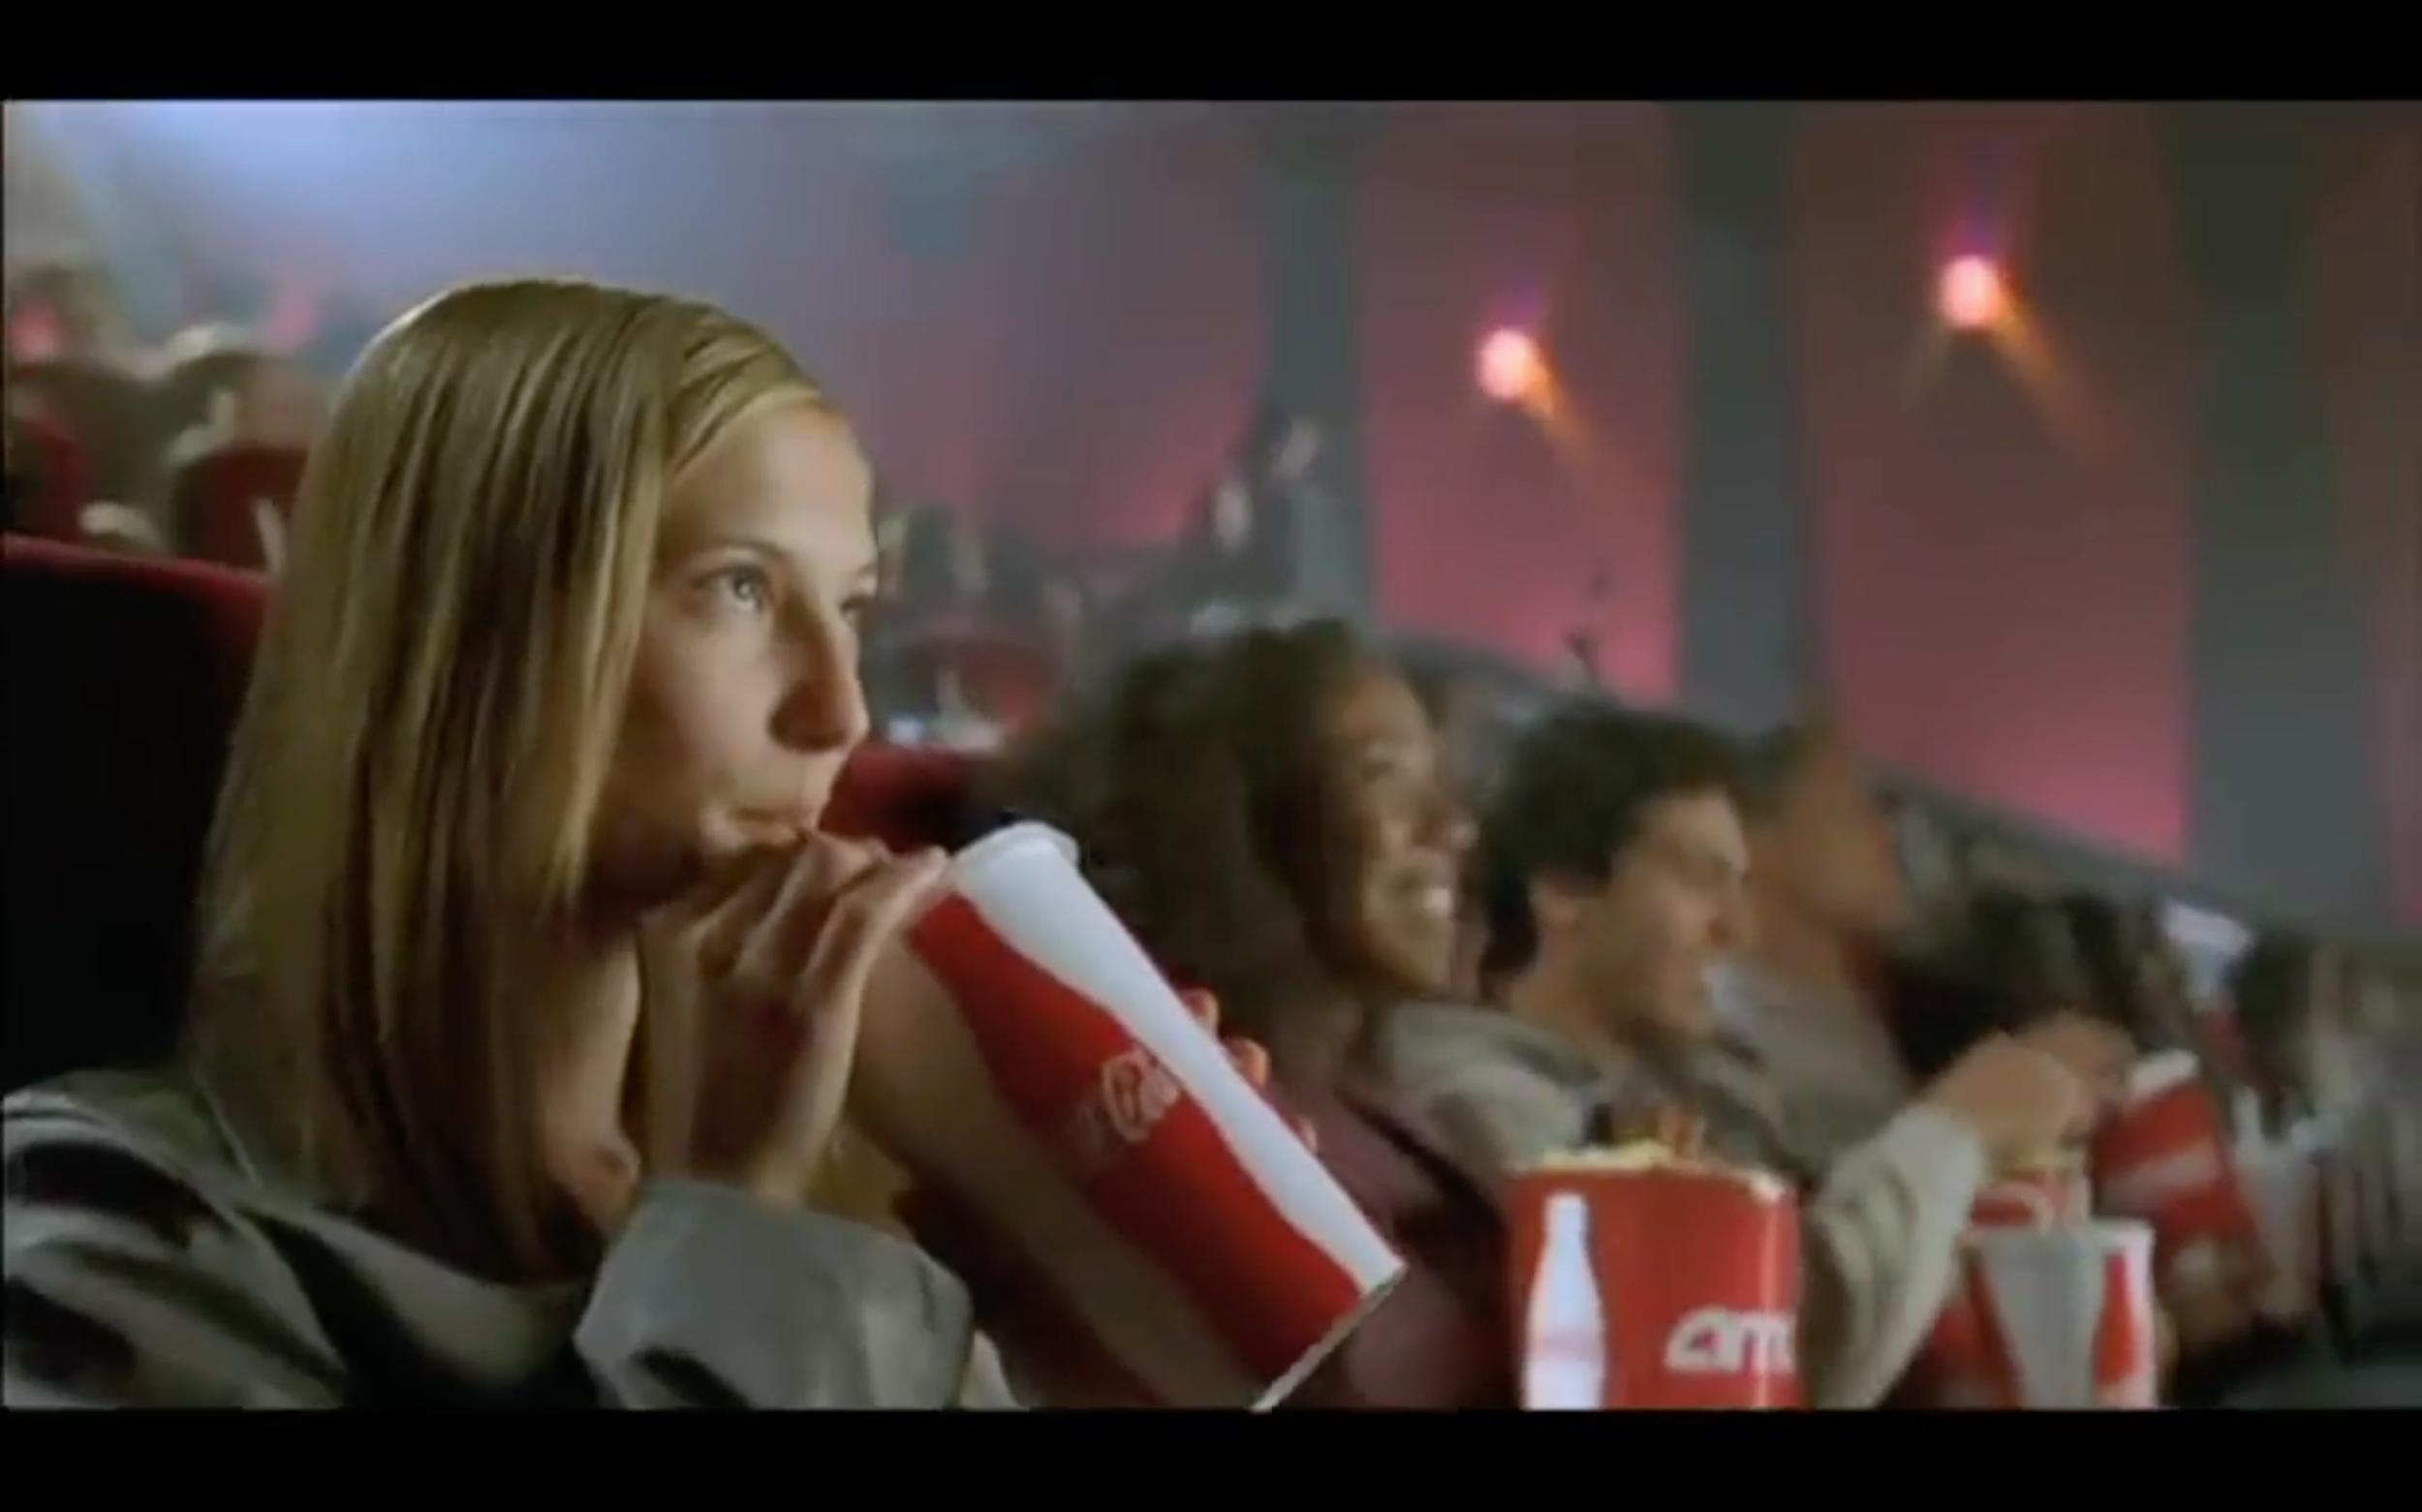 MAGIC CHAIRS - Coca-Cola